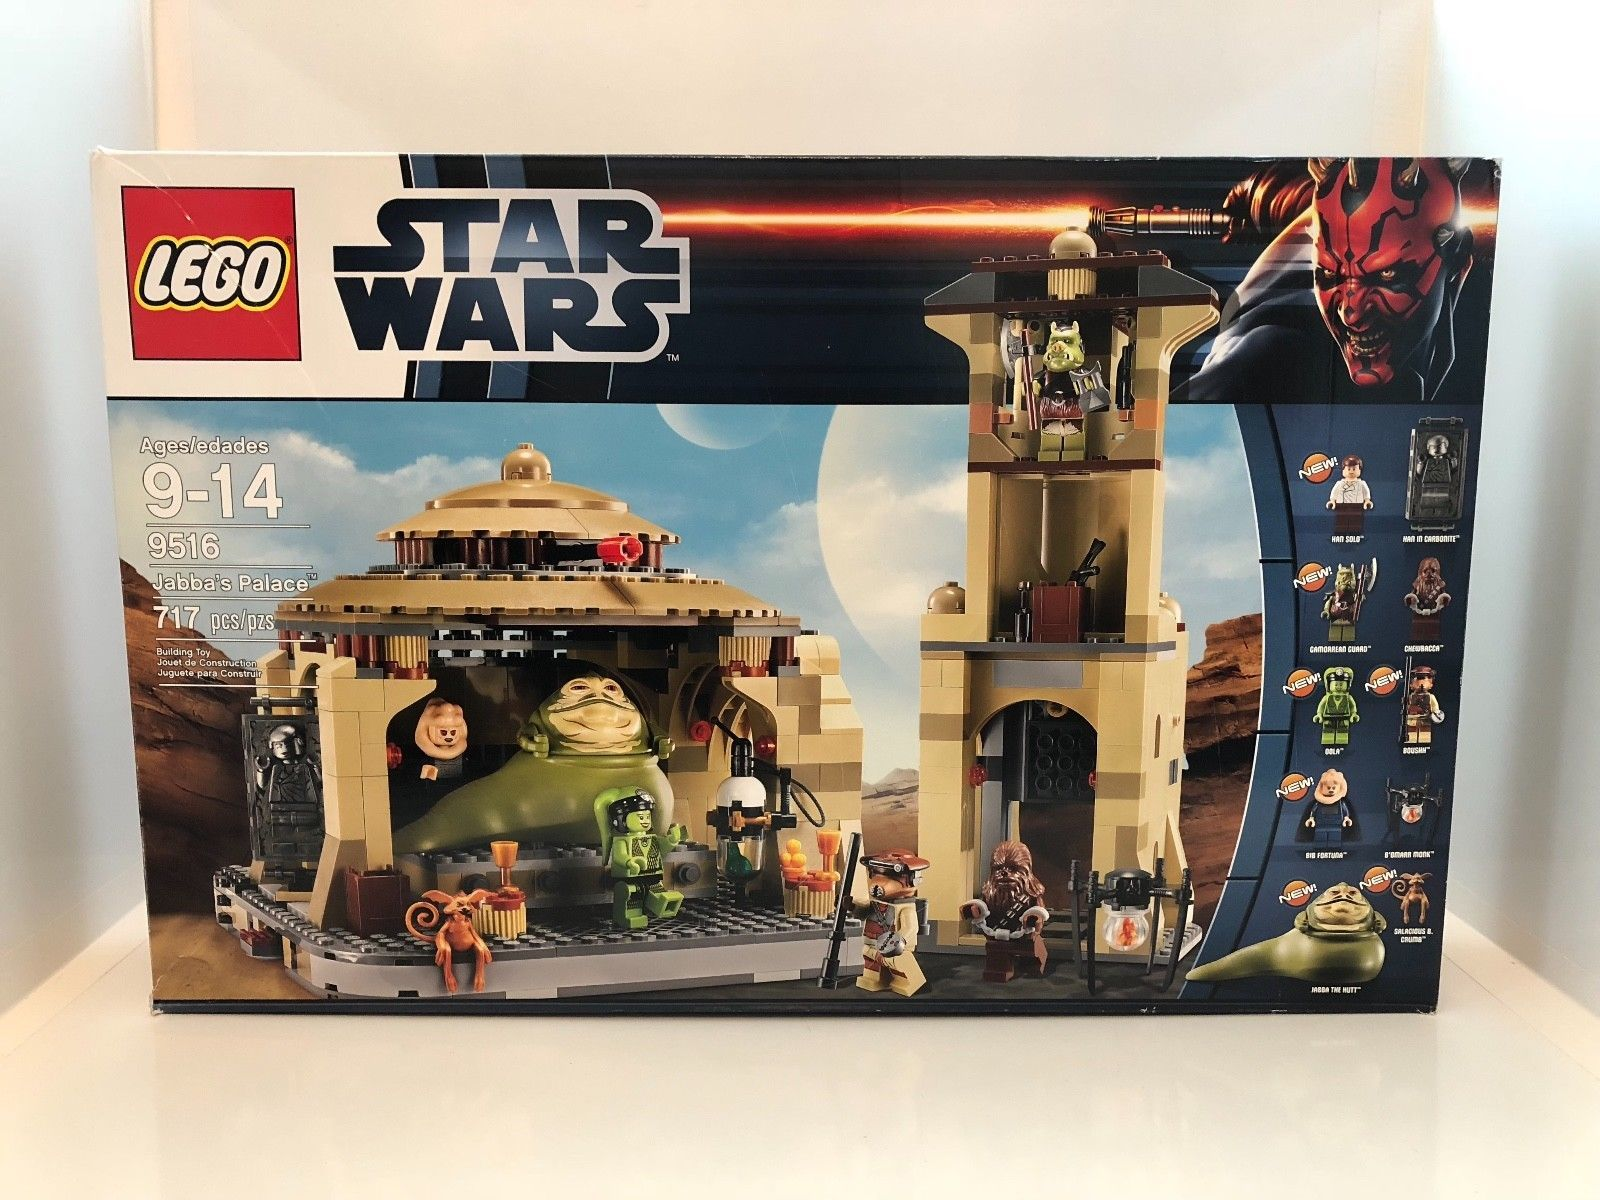 LEGO NEW 2x4 Dark Stone Grey Wing Left 4210788 Brick 41770 10x